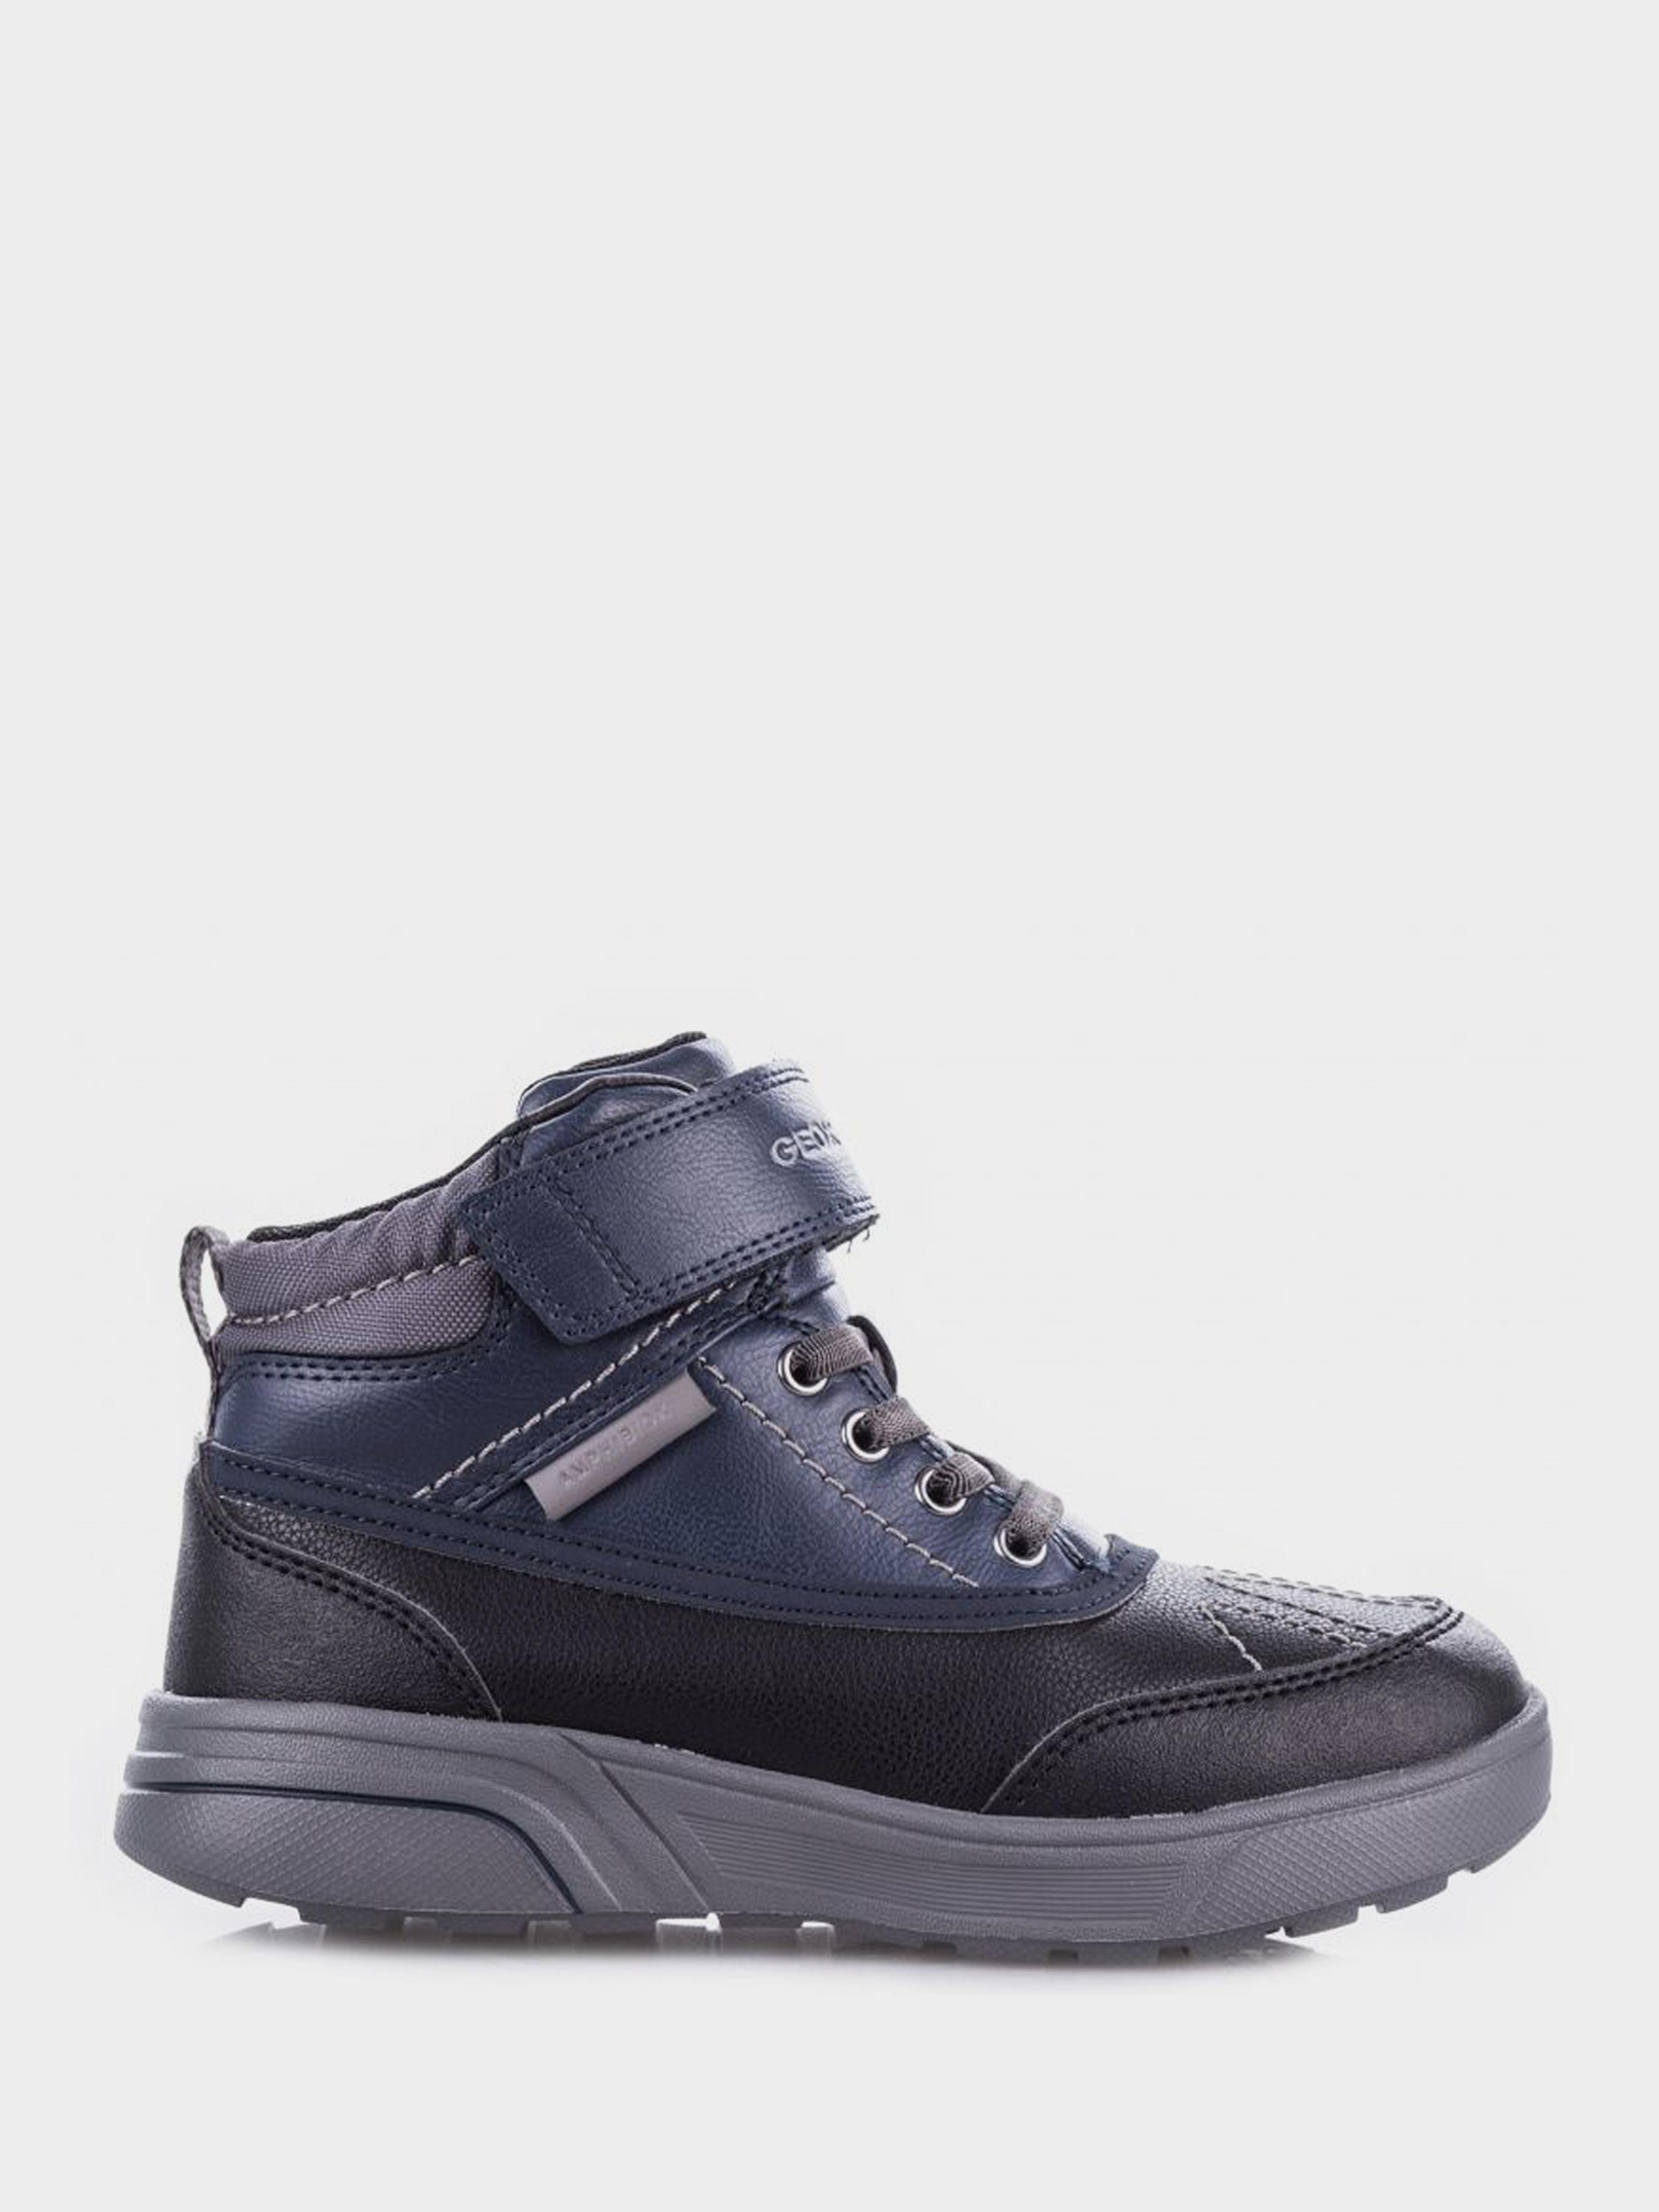 Купить Ботинки детские Geox J SVEGGEN BOY B ABX XK5959, Синий